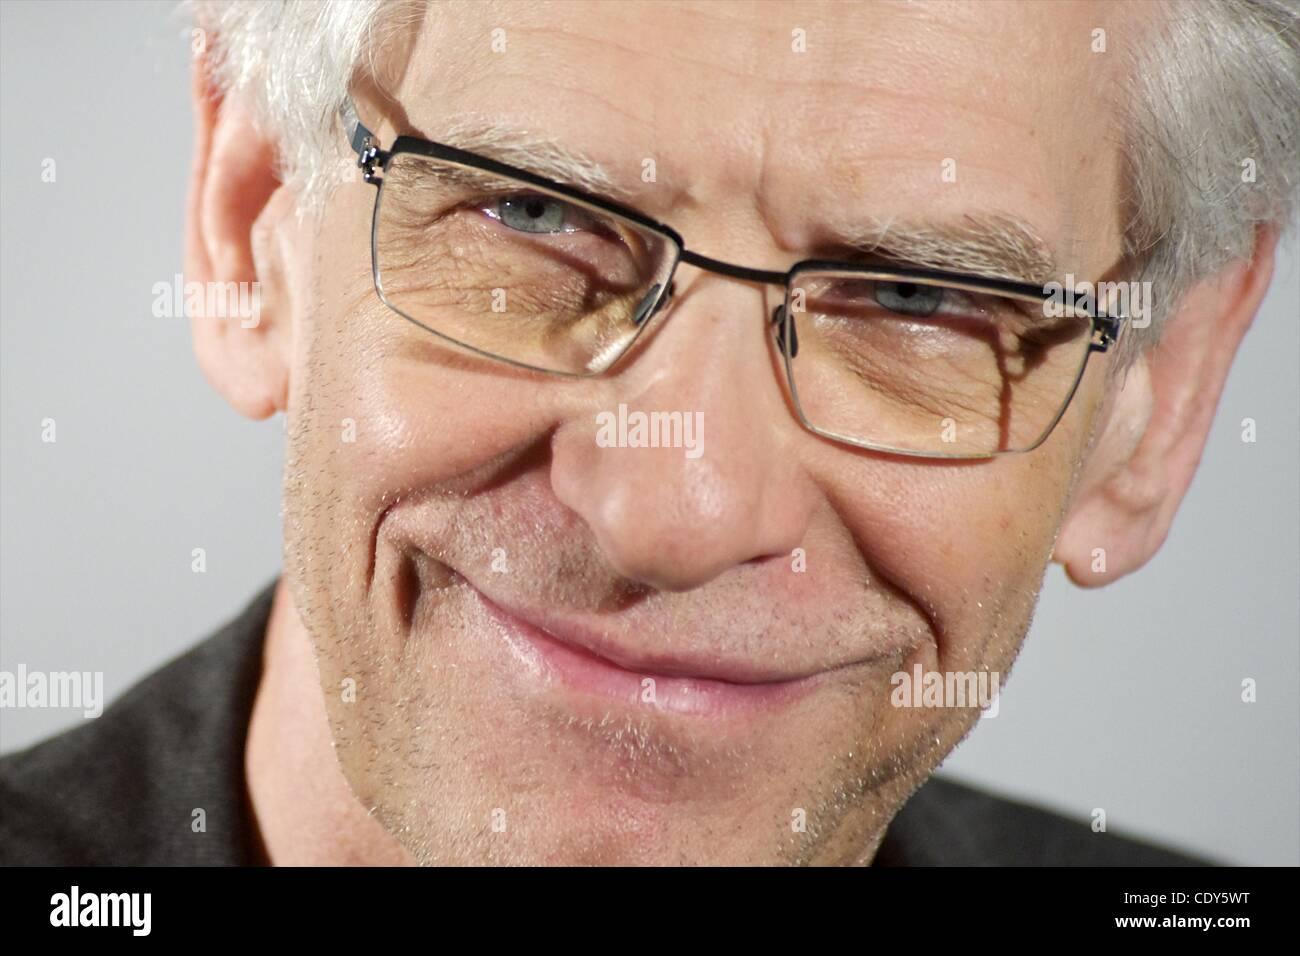 Nov. 2, 2011 - Madrid, Spain - Director David Cronenberg attends 'Un Metodo Peligroso' (A Dangerous Method) photocall Stock Photo